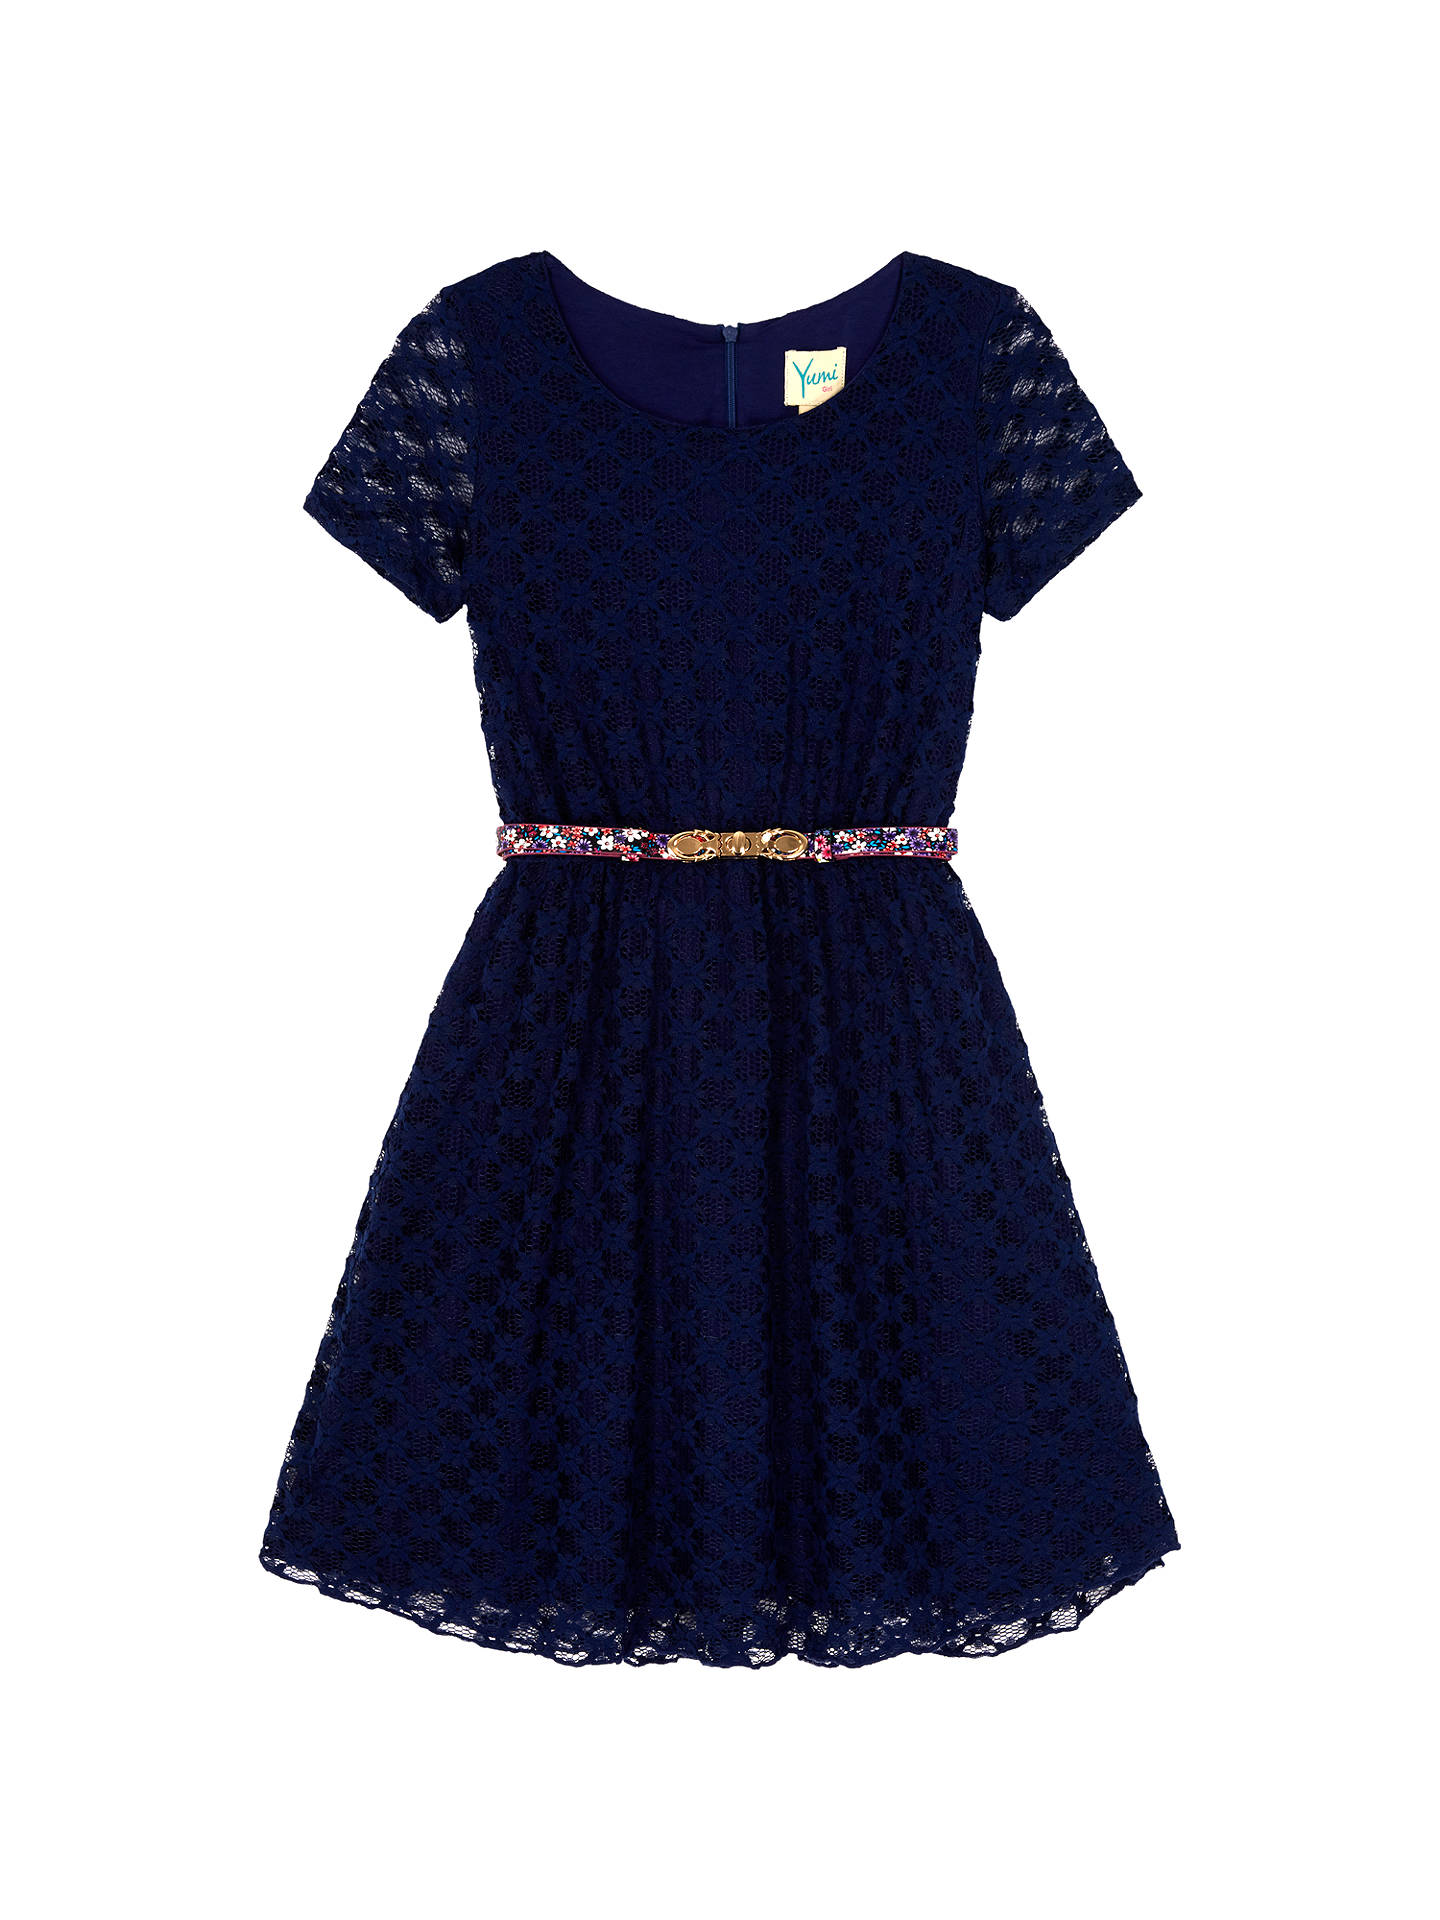 b117c663ce65 Buy Yumi Girl Lace Skater Dress